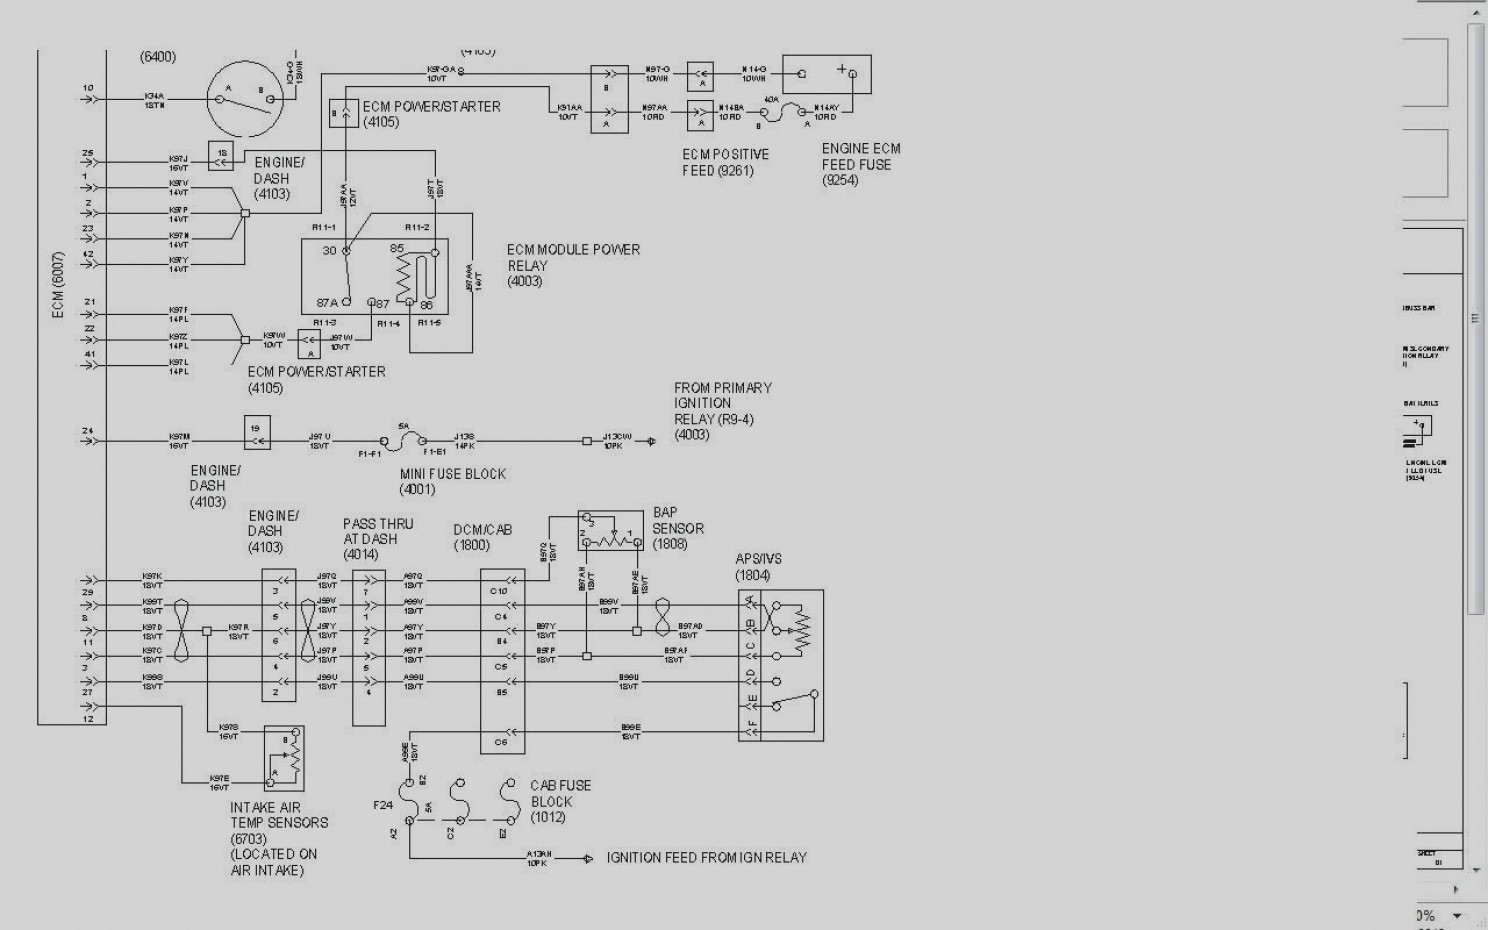 International 4300 Engine Diagram - Get Rid Of Wiring ... on international 9400 ac wiring diagram, international 4700 wiring diagram, international 9800 ac wiring diagram, international prostar wiring-diagram,